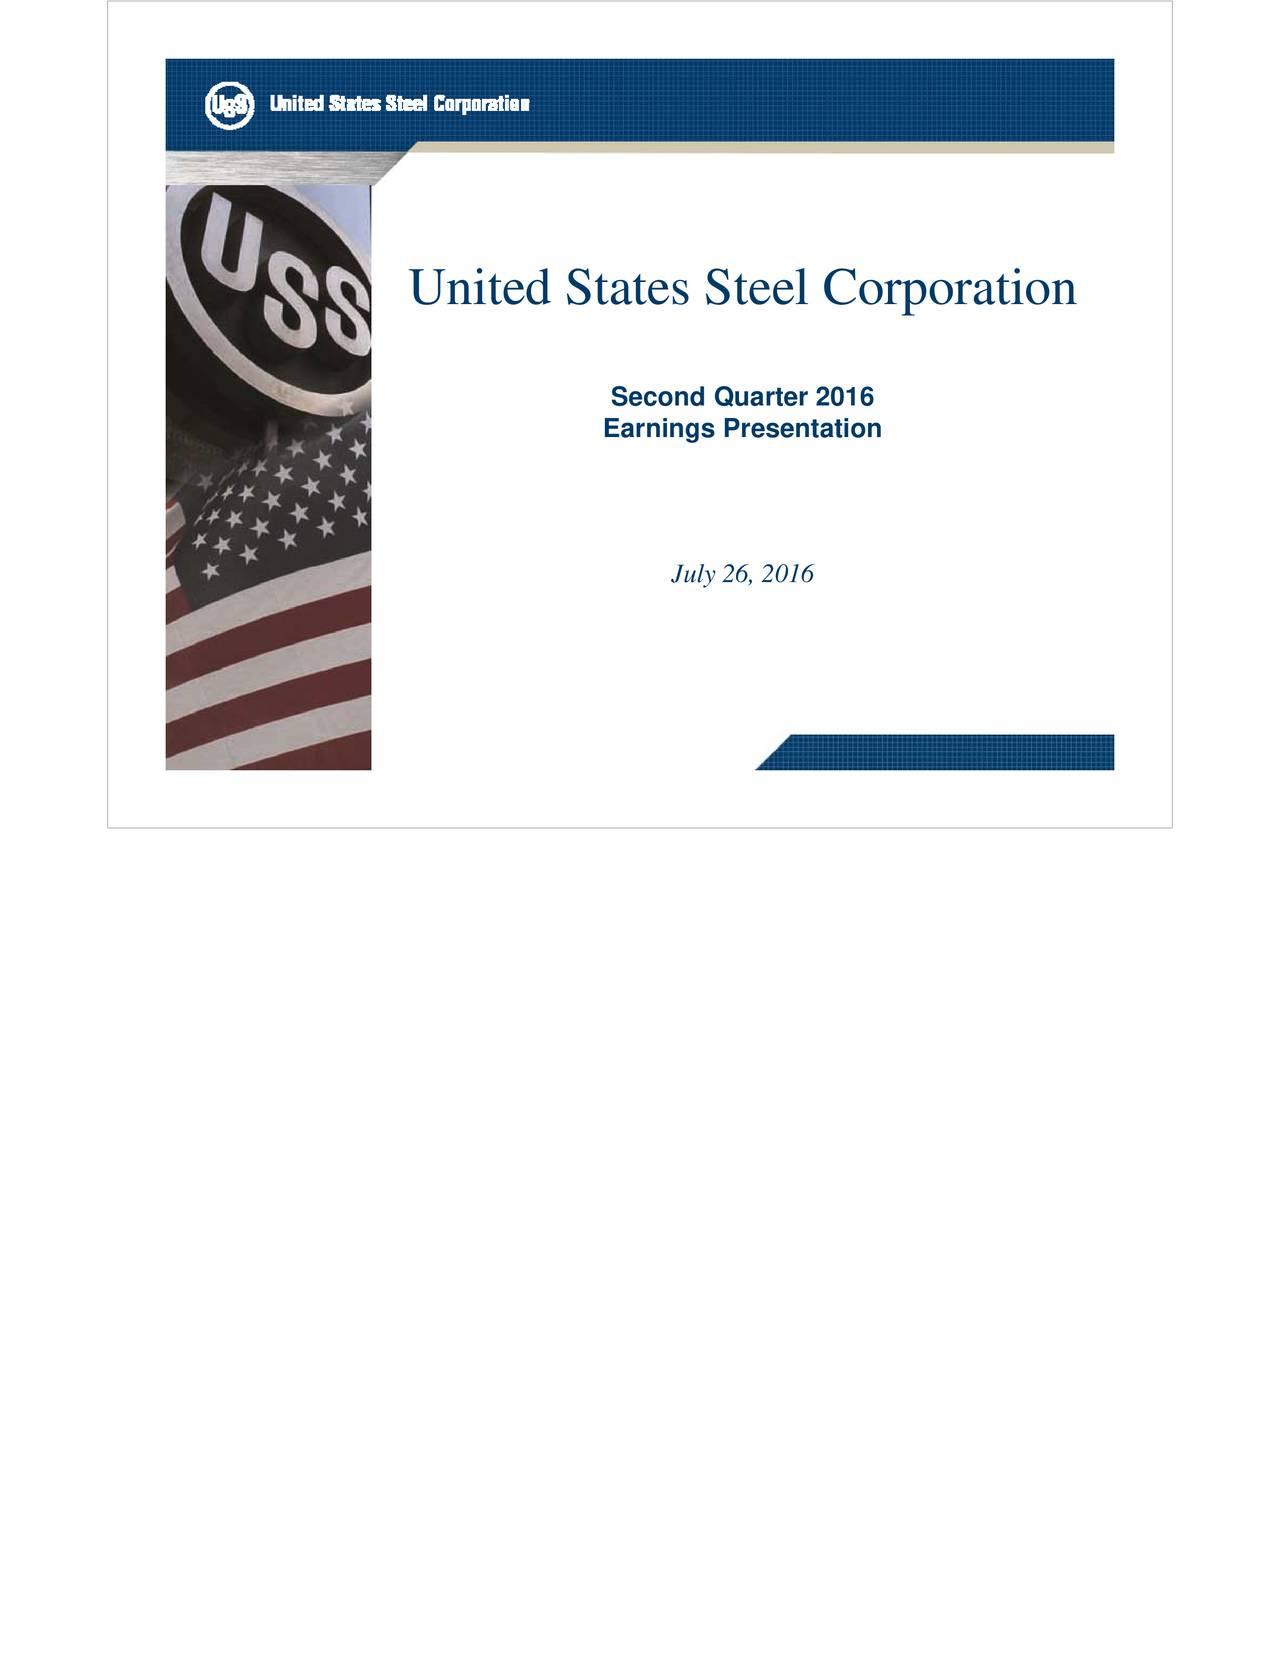 Second Quarter 2016 Earnings Presentation July26,20166 2011 United States Steel Corporation